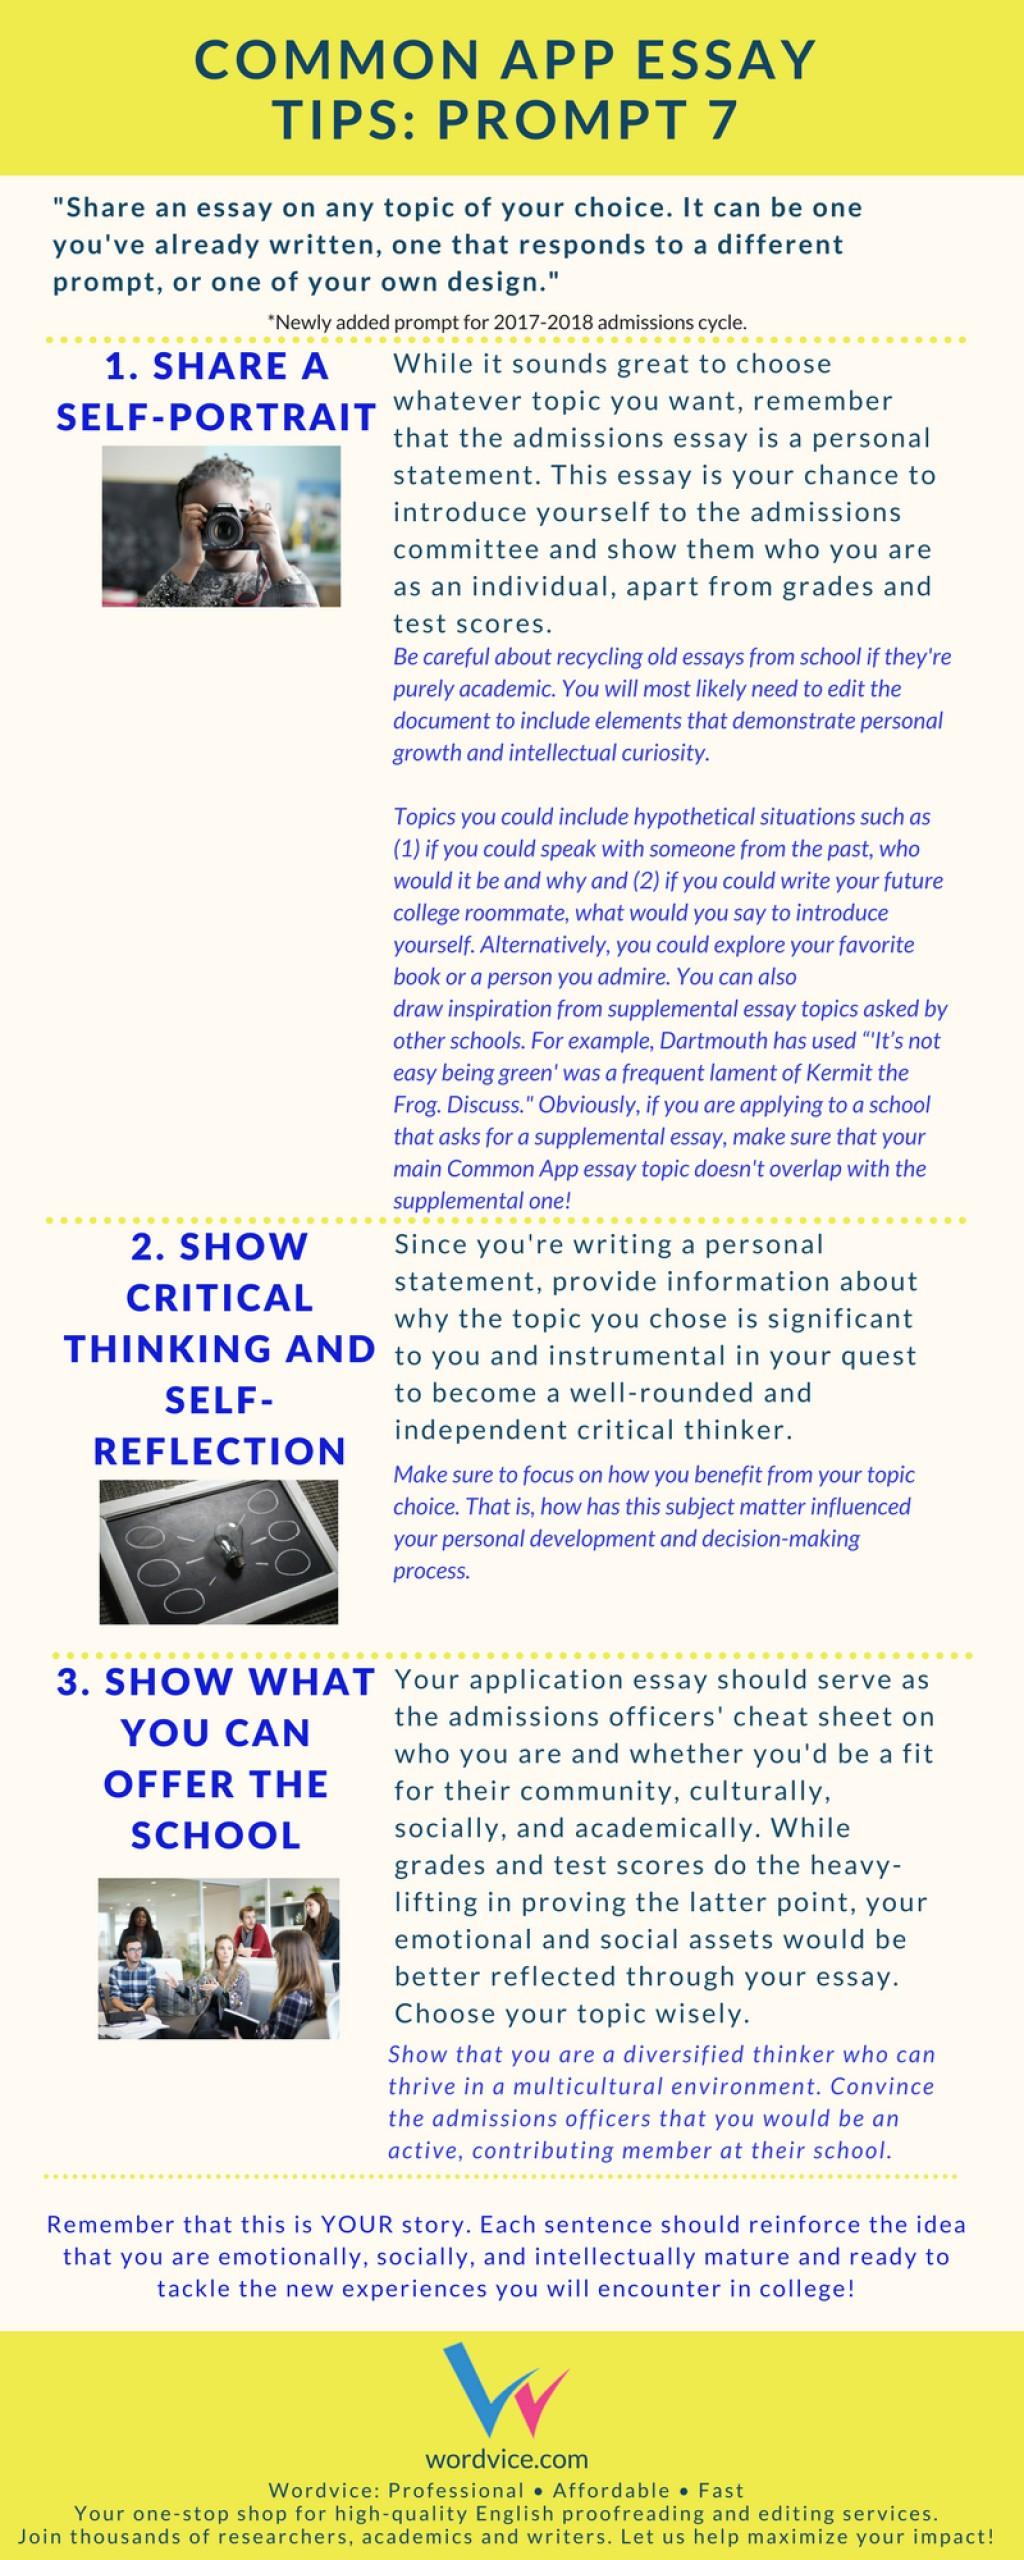 021 Essay Example Common App Brainstormprompt College Topics Frightening 2017 Boston Prompts Harvard Ideas Large